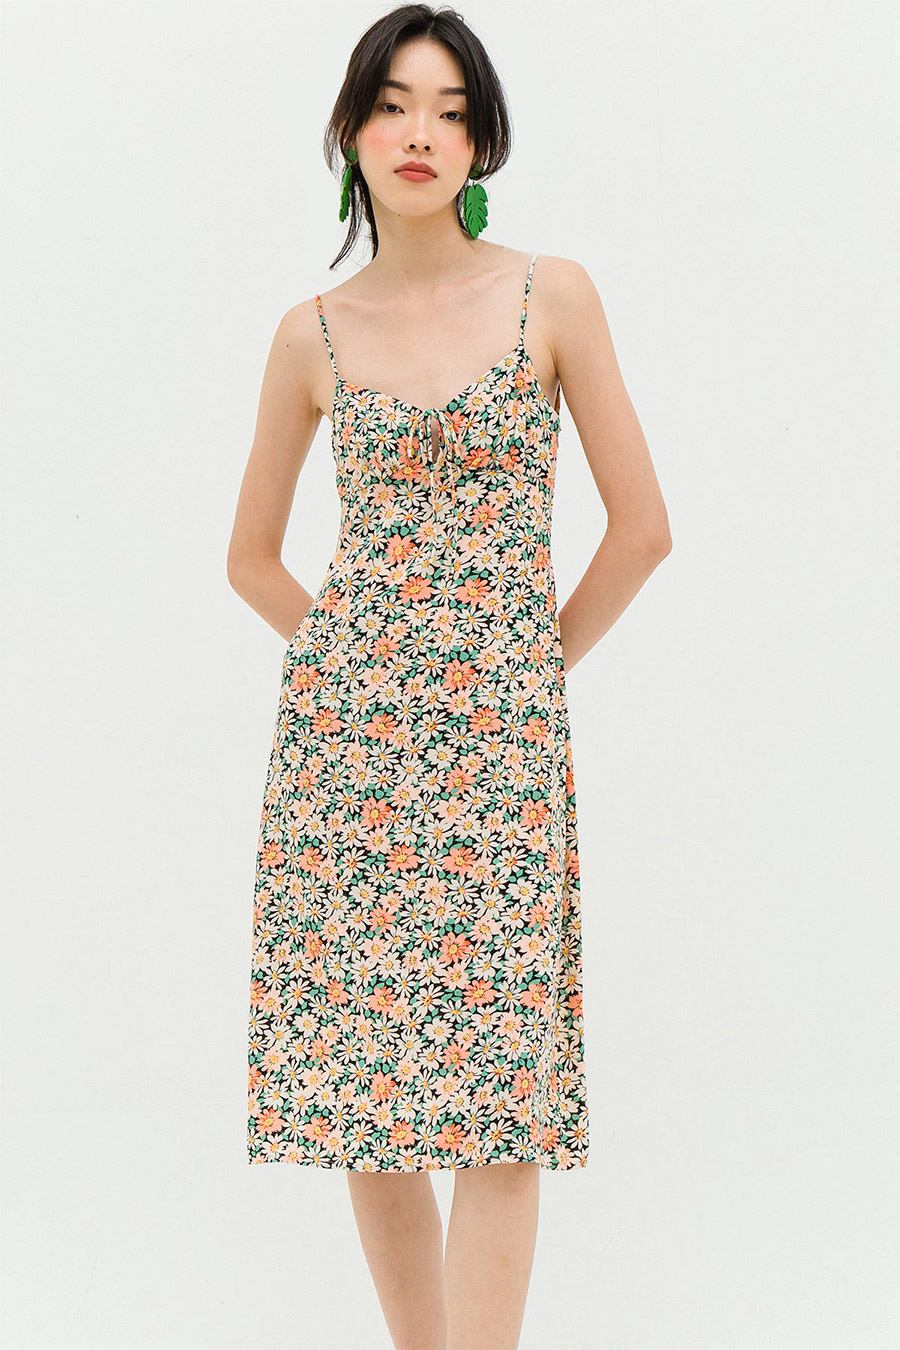 *BO* CAMILLE DRESS - DAHLIA